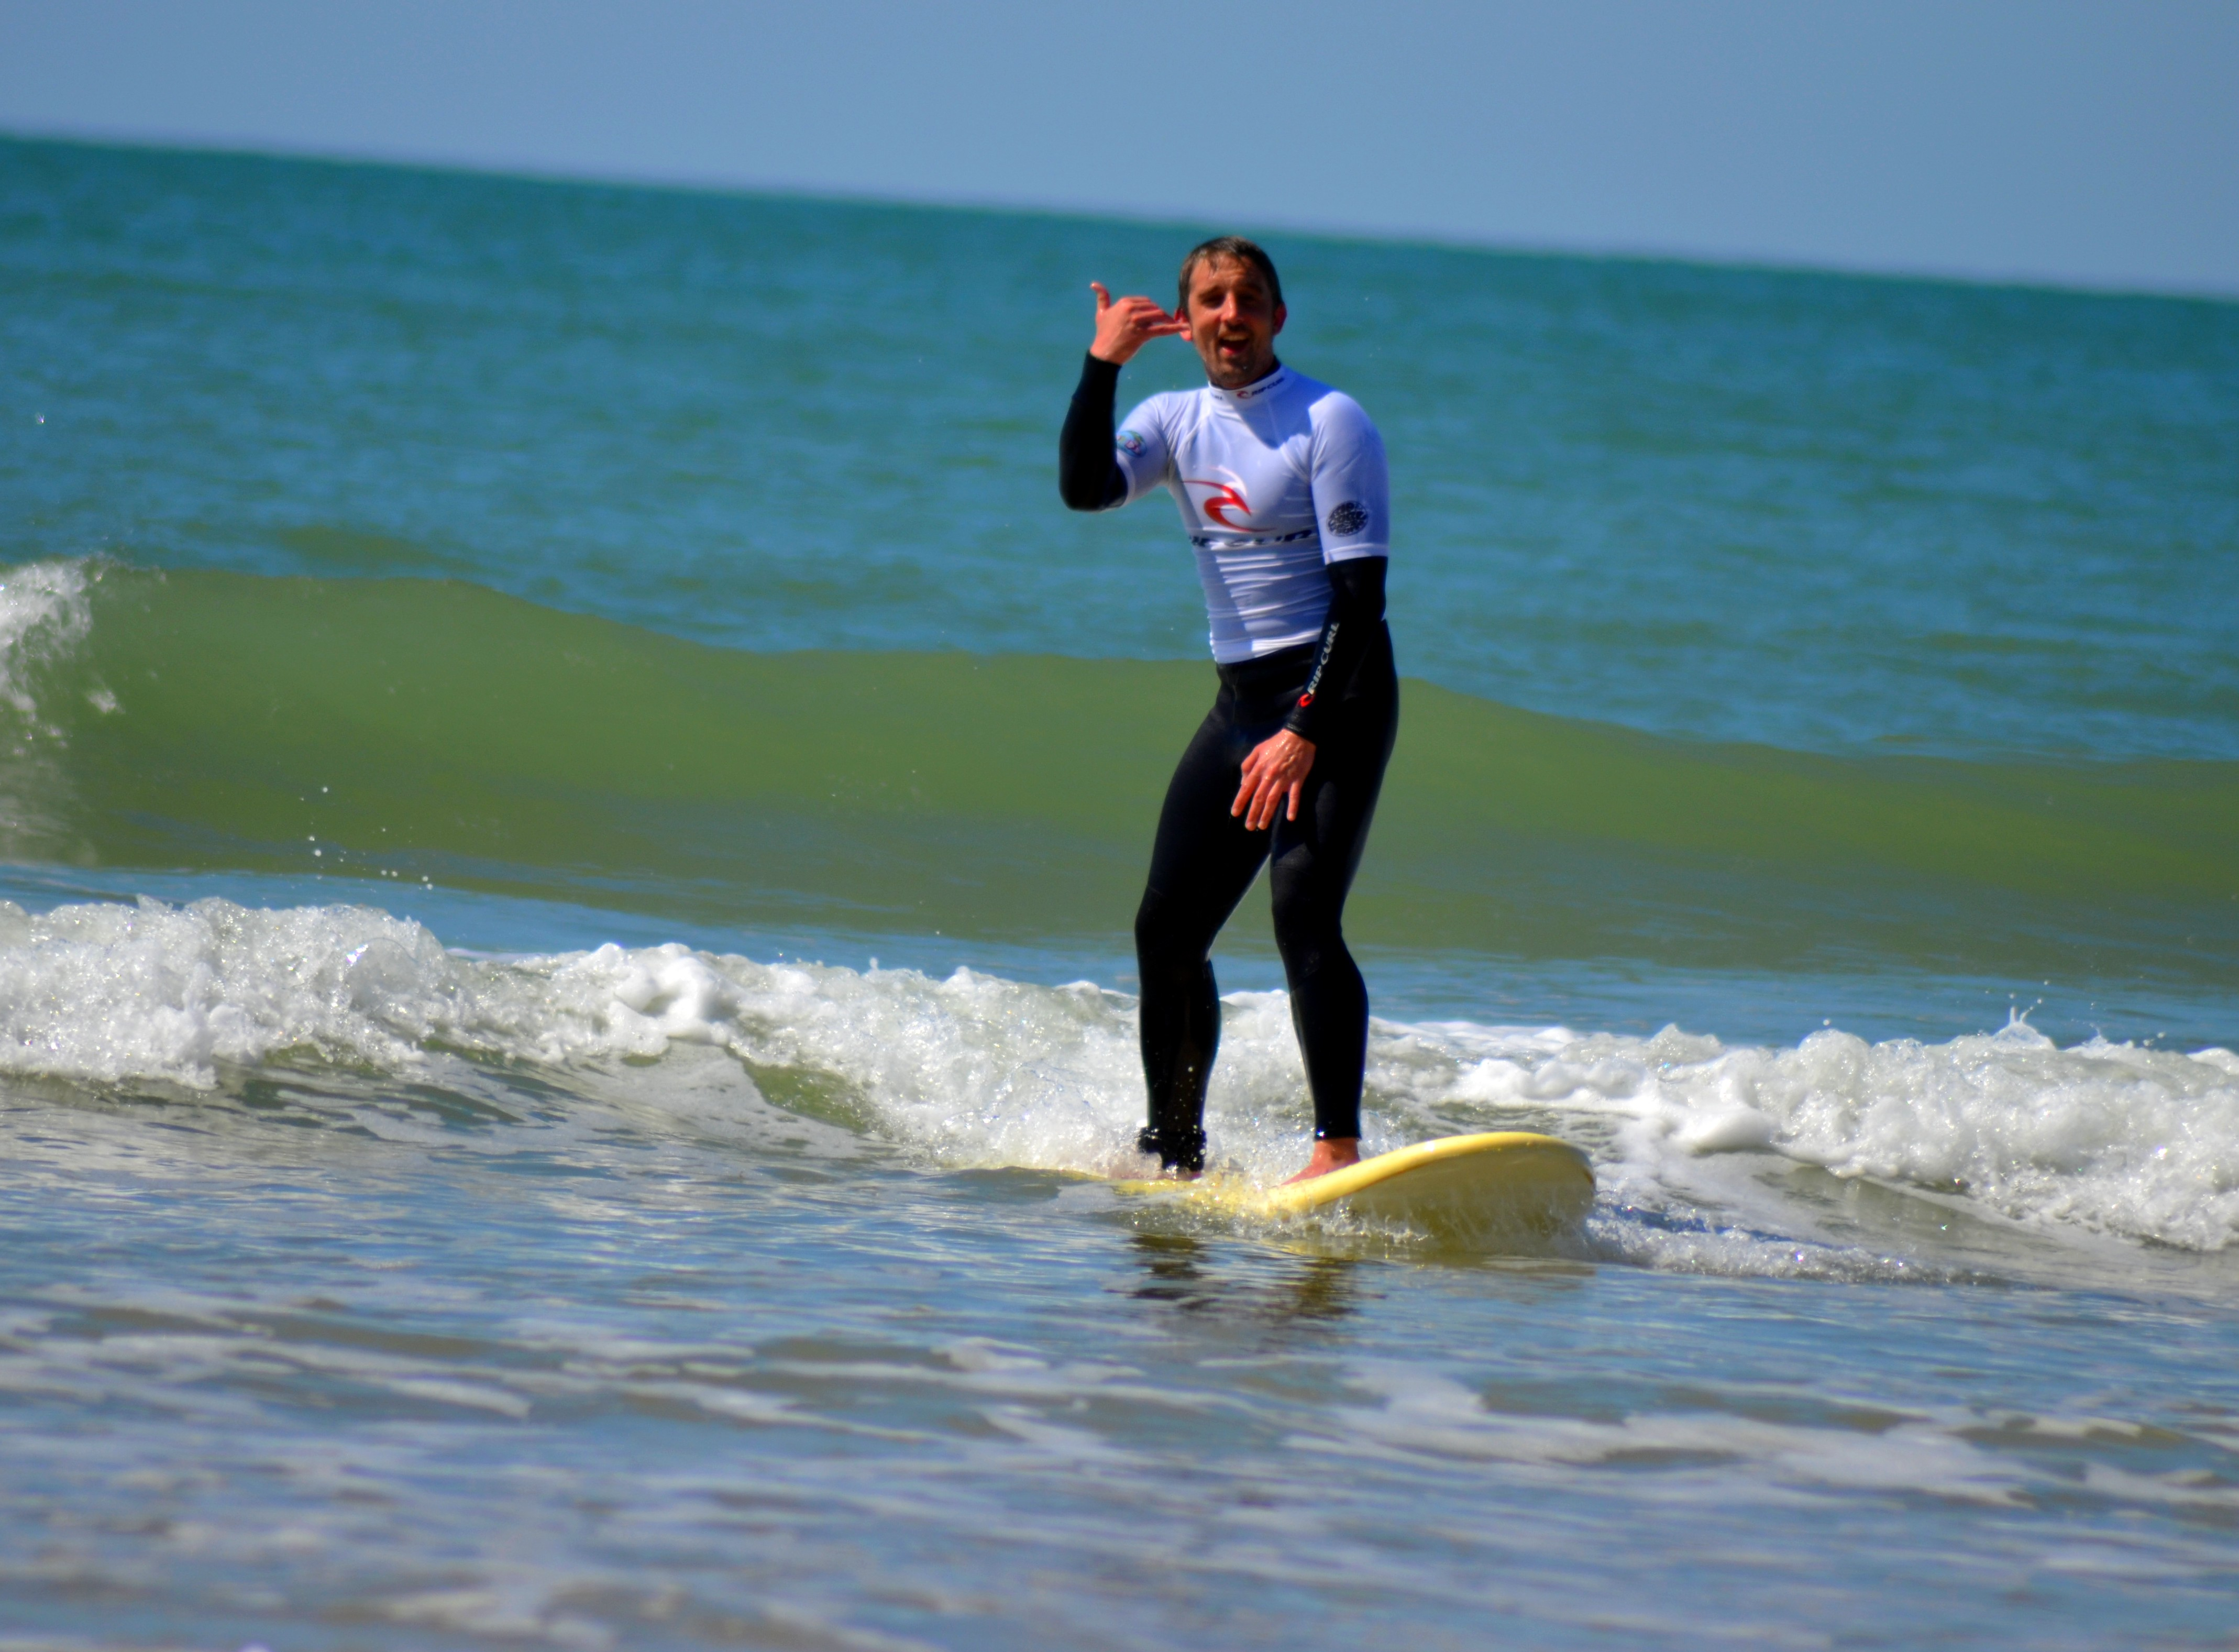 ecole surf La tremblade